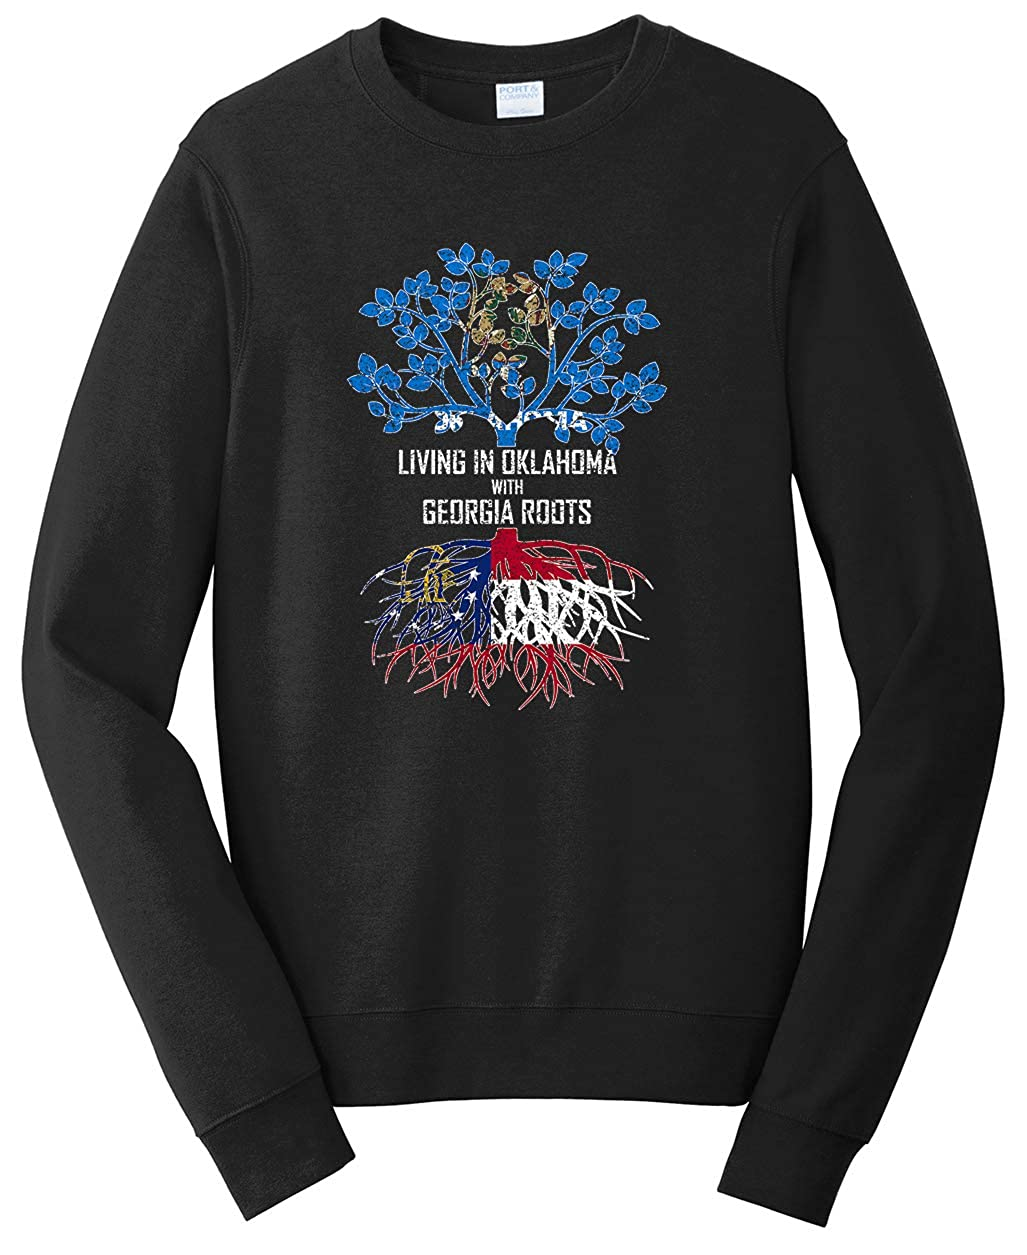 Tenacitee Unisex Living in Oklahoma Georgia Roots Sweatshirt